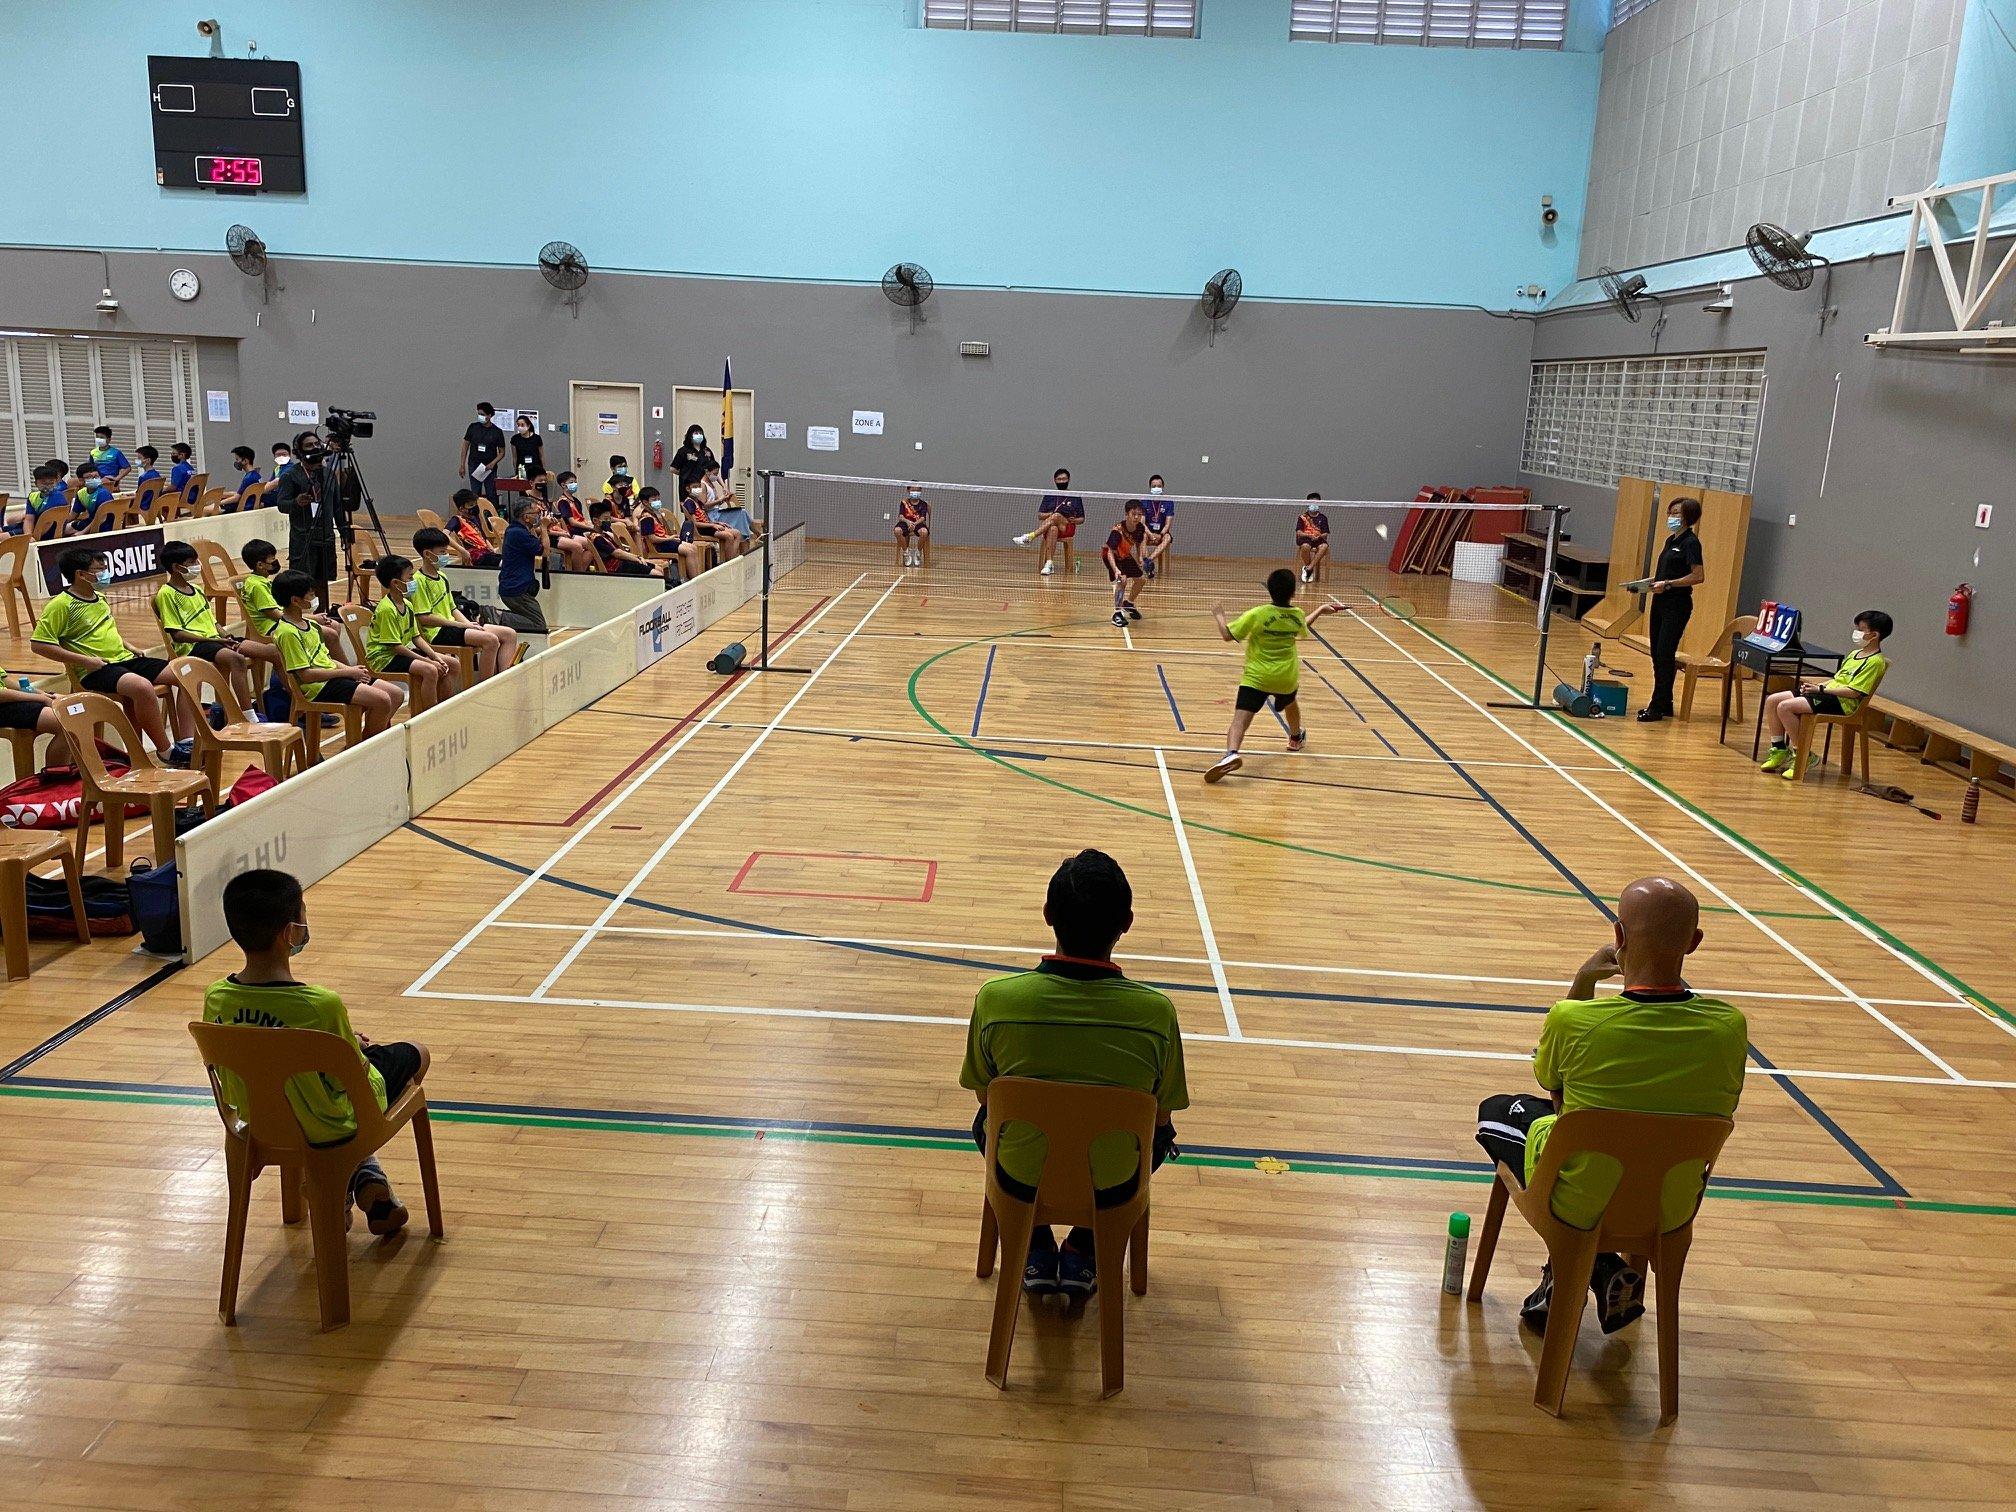 NSG Snr Div South Zone boys' badminton_ SJI Junior (green) vs ACS Primary (orange) 2